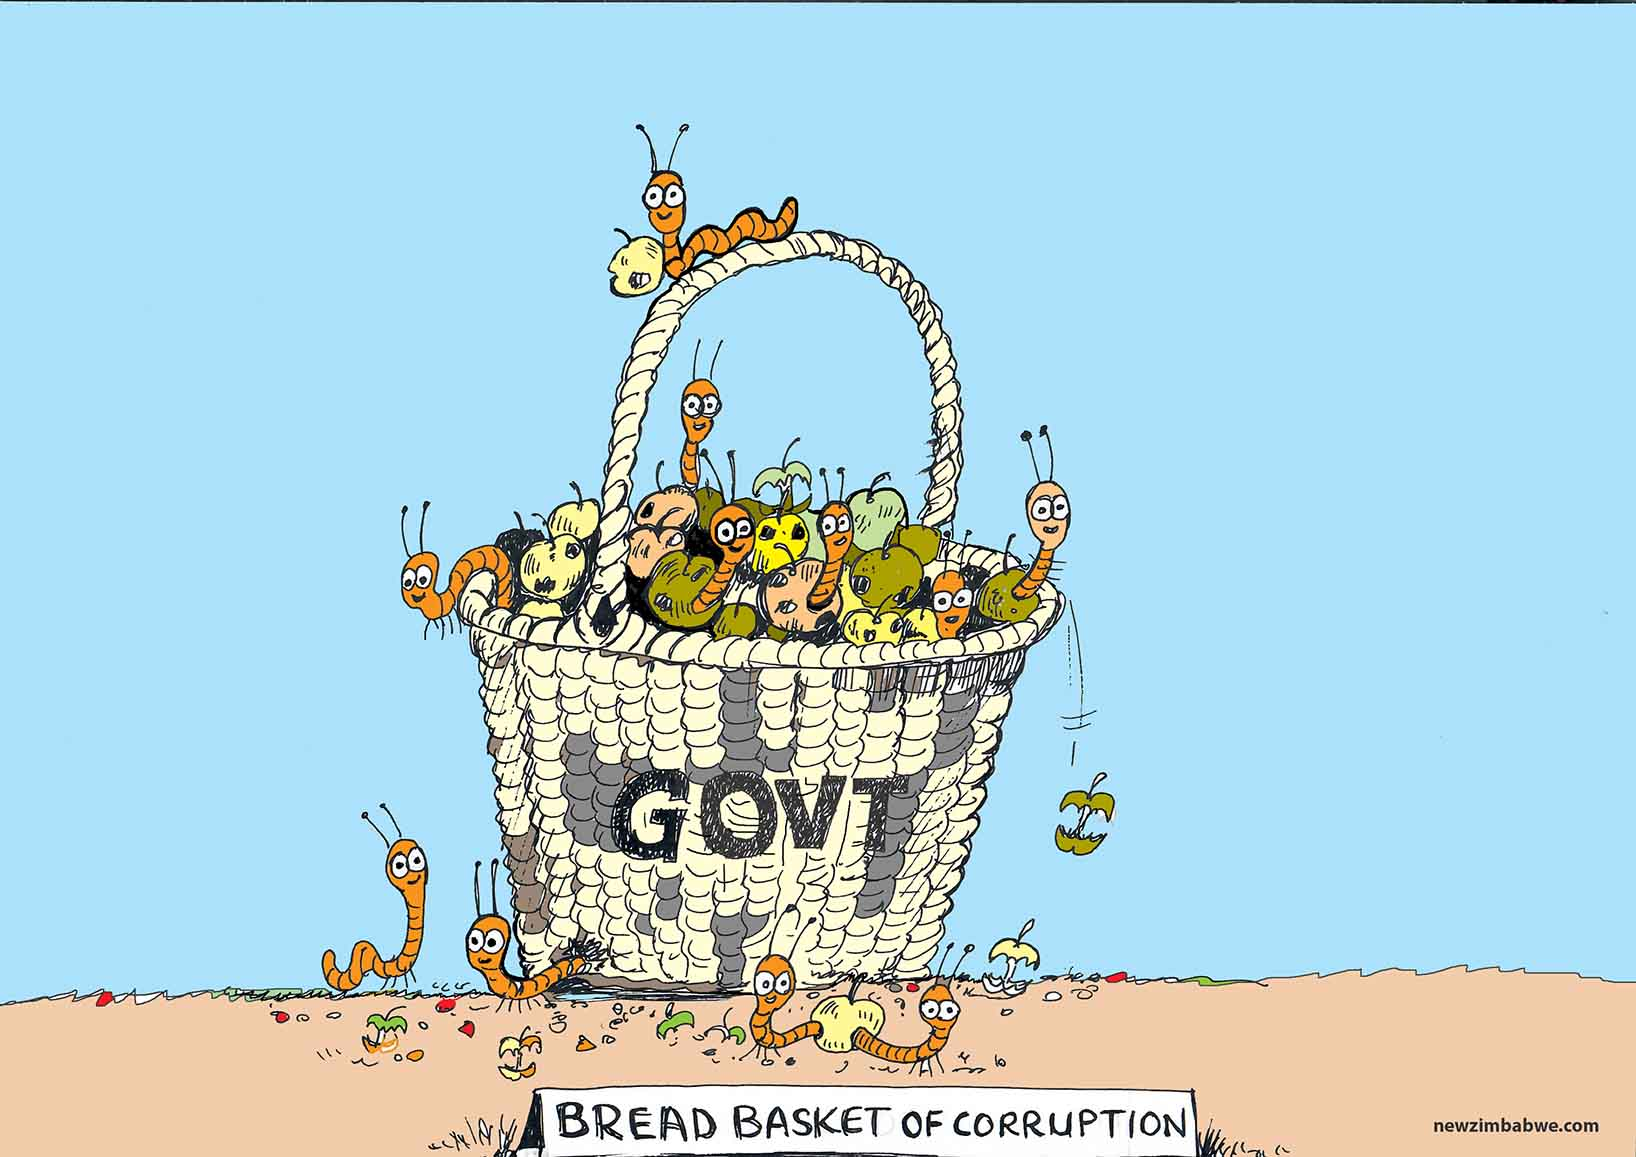 Bread basket of corruption